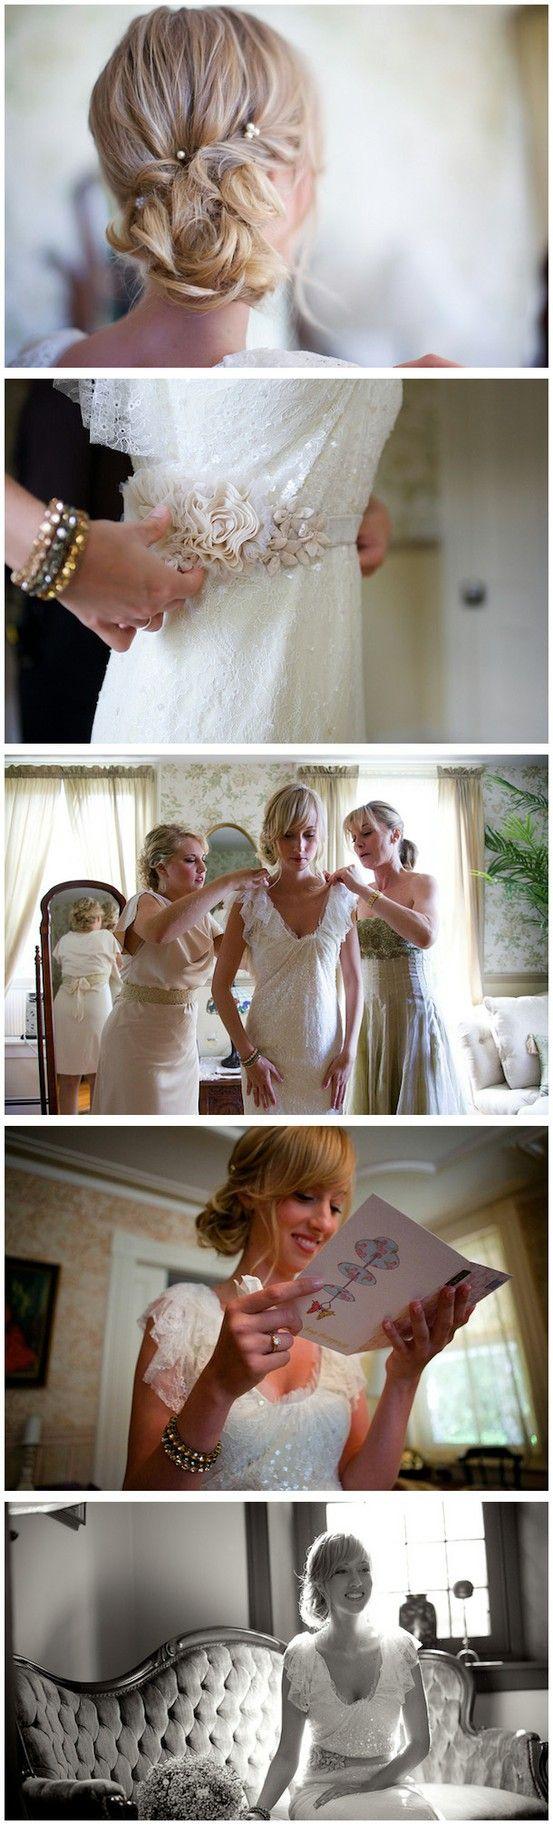 wedding hair wedding hair: Hair Ideas, Bridesmaid Hair, Bridesmaids Hair, Bride Pictures, Beautiful Dresses, Wedding Hairs, Hair Style, The Dresses, Chic Weddings